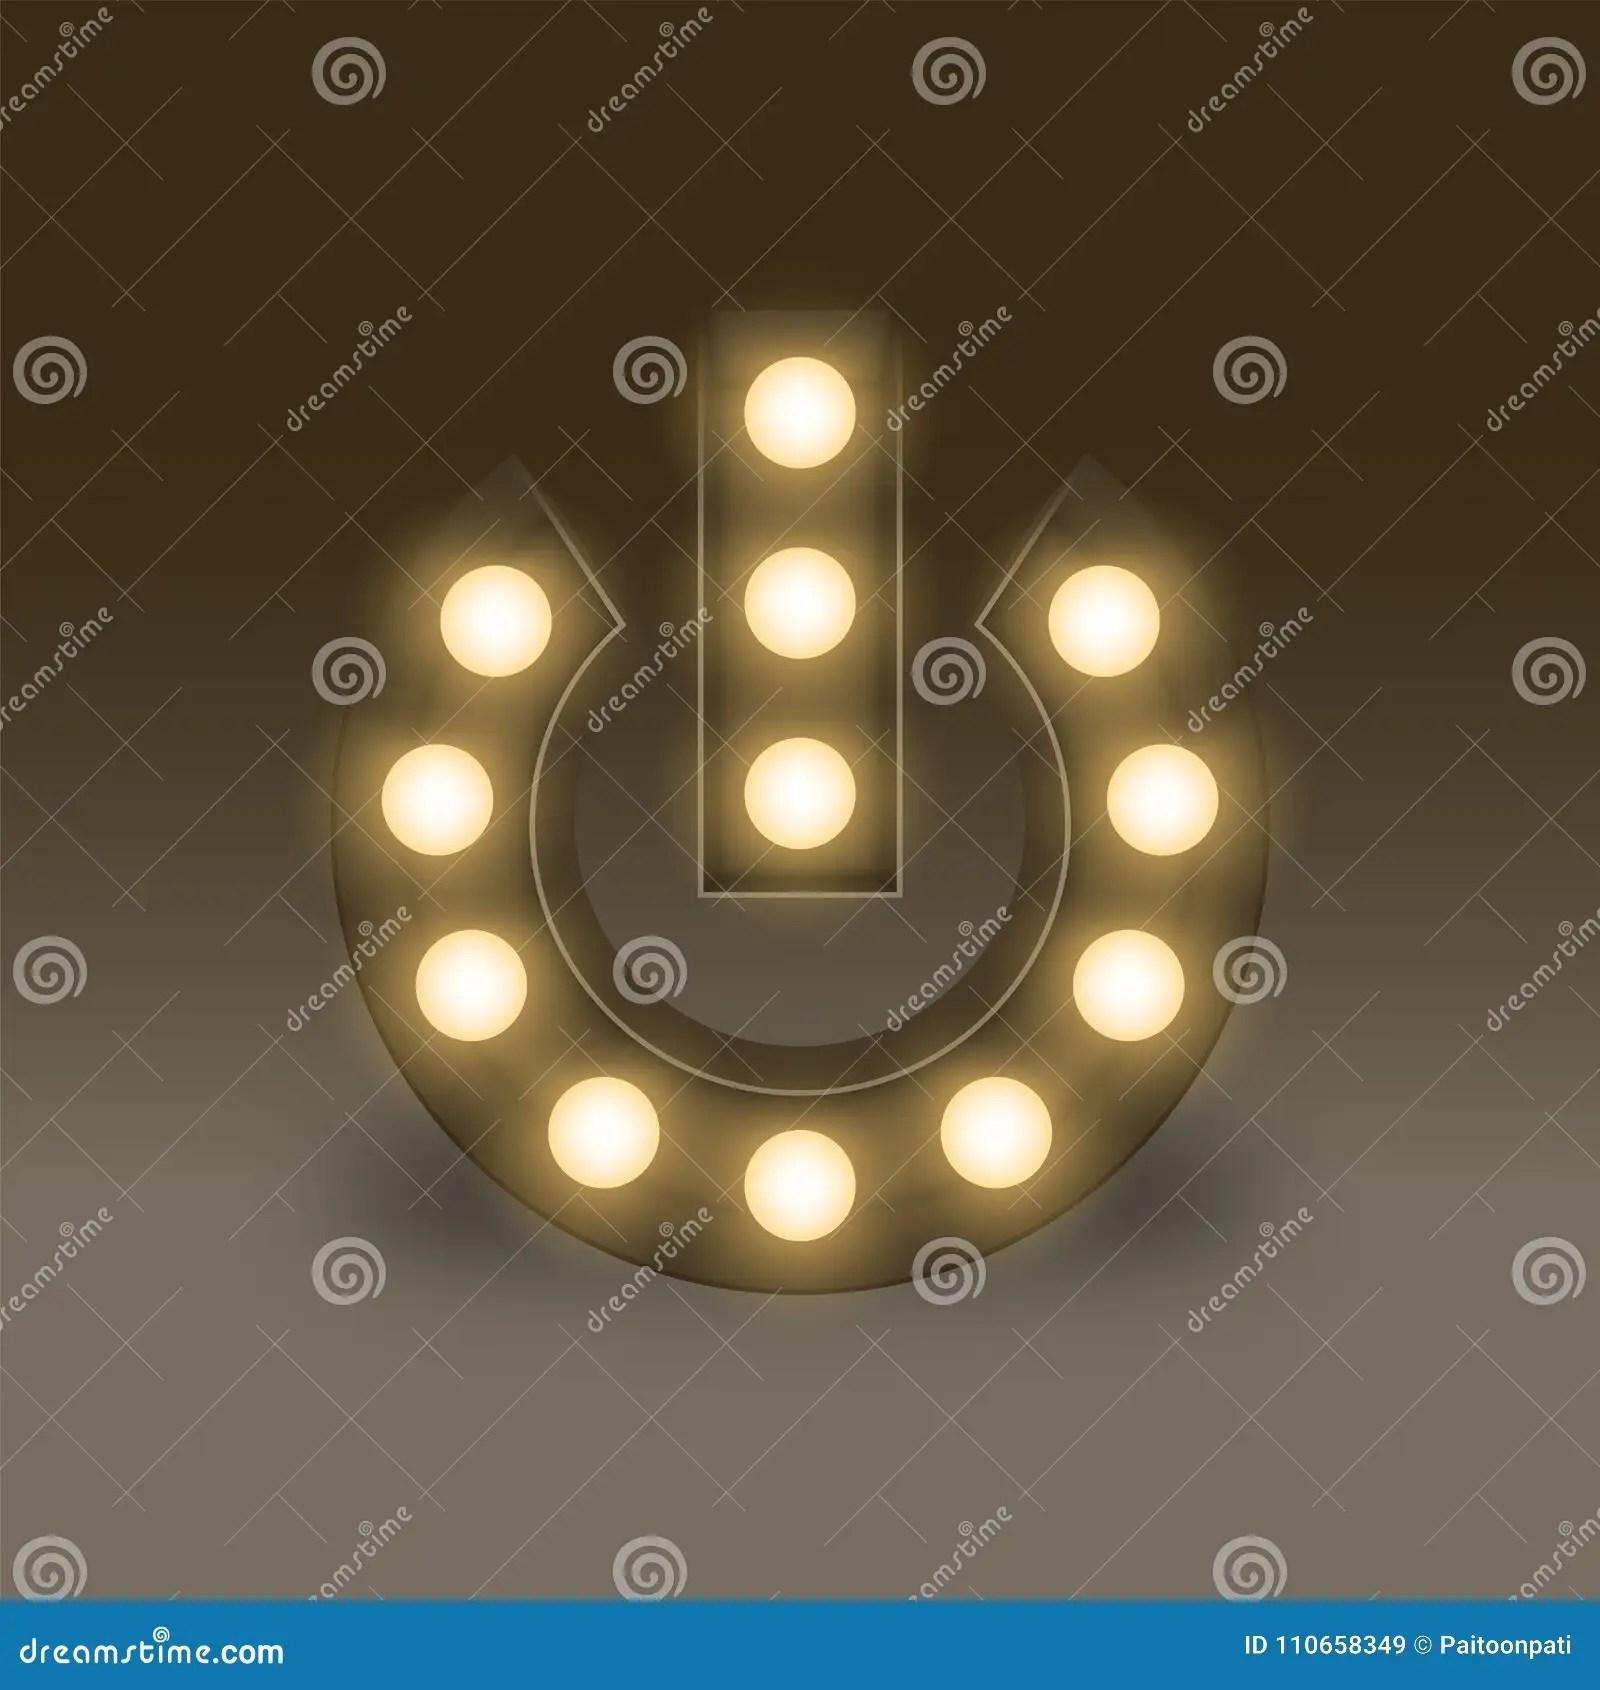 hight resolution of symbol incandescent light bulb box set power sign icon illustration retro 3d